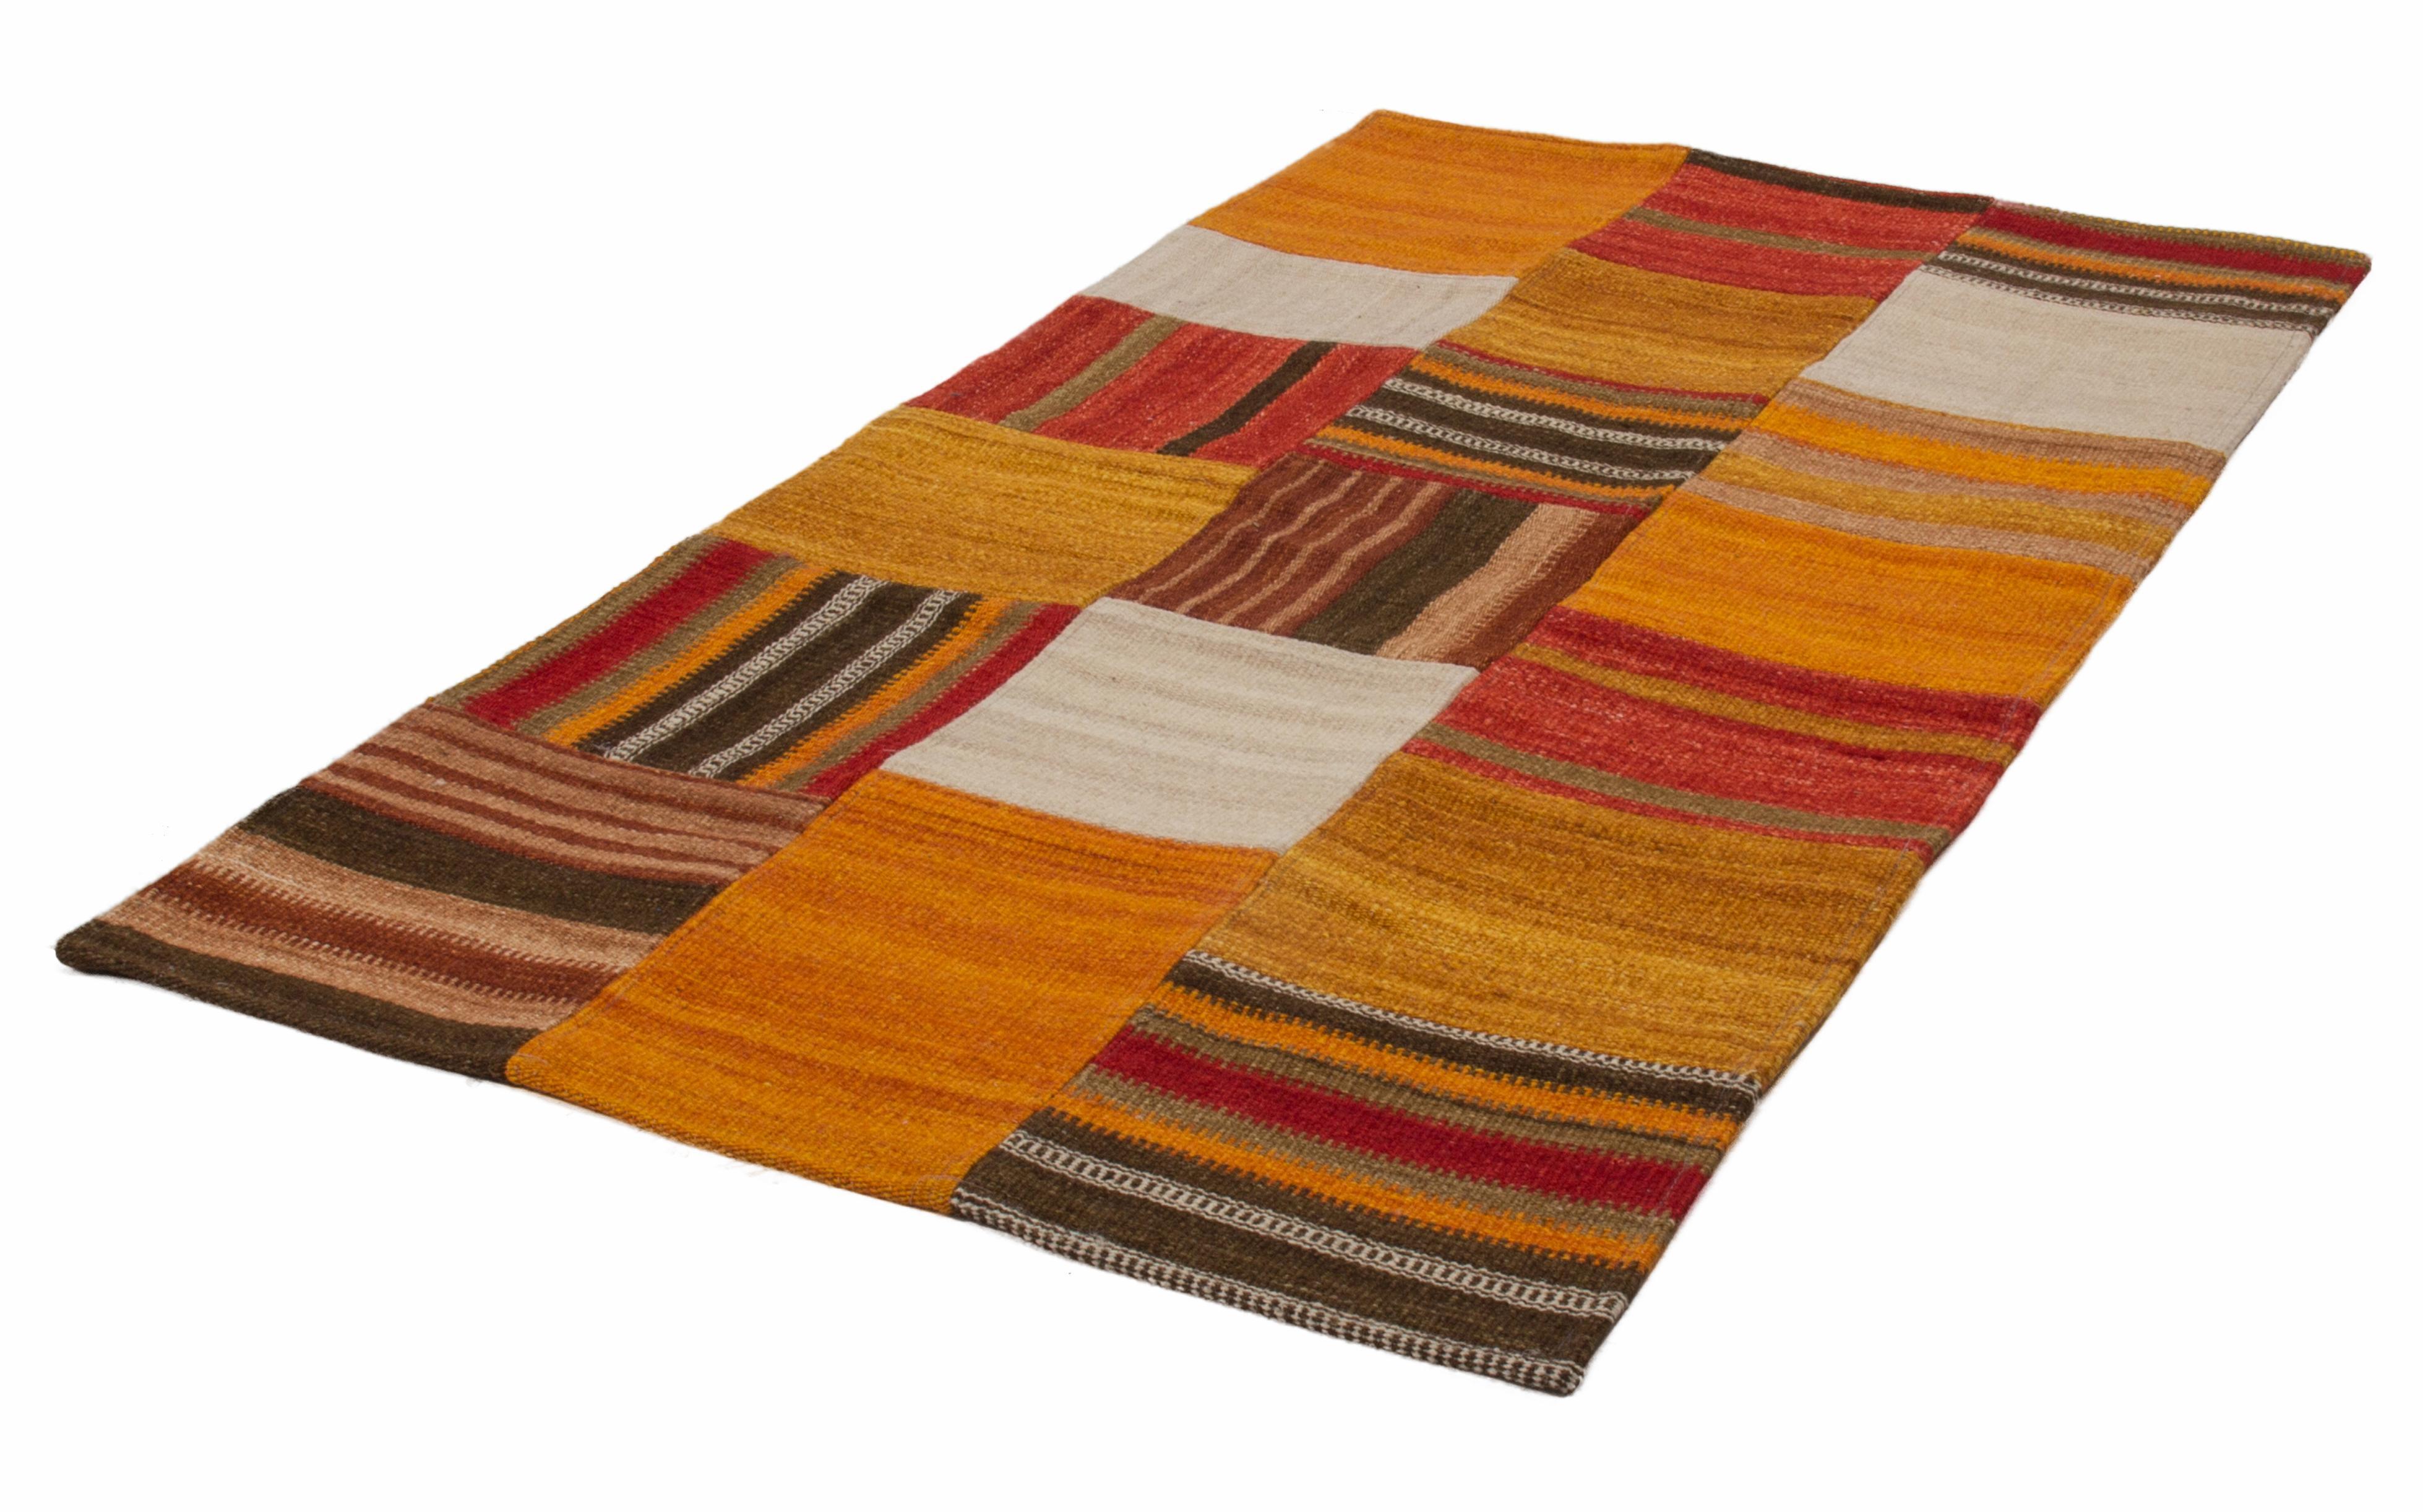 Teppich Radical 210 Kayoom rechteckig Höhe 12 mm handgewebt